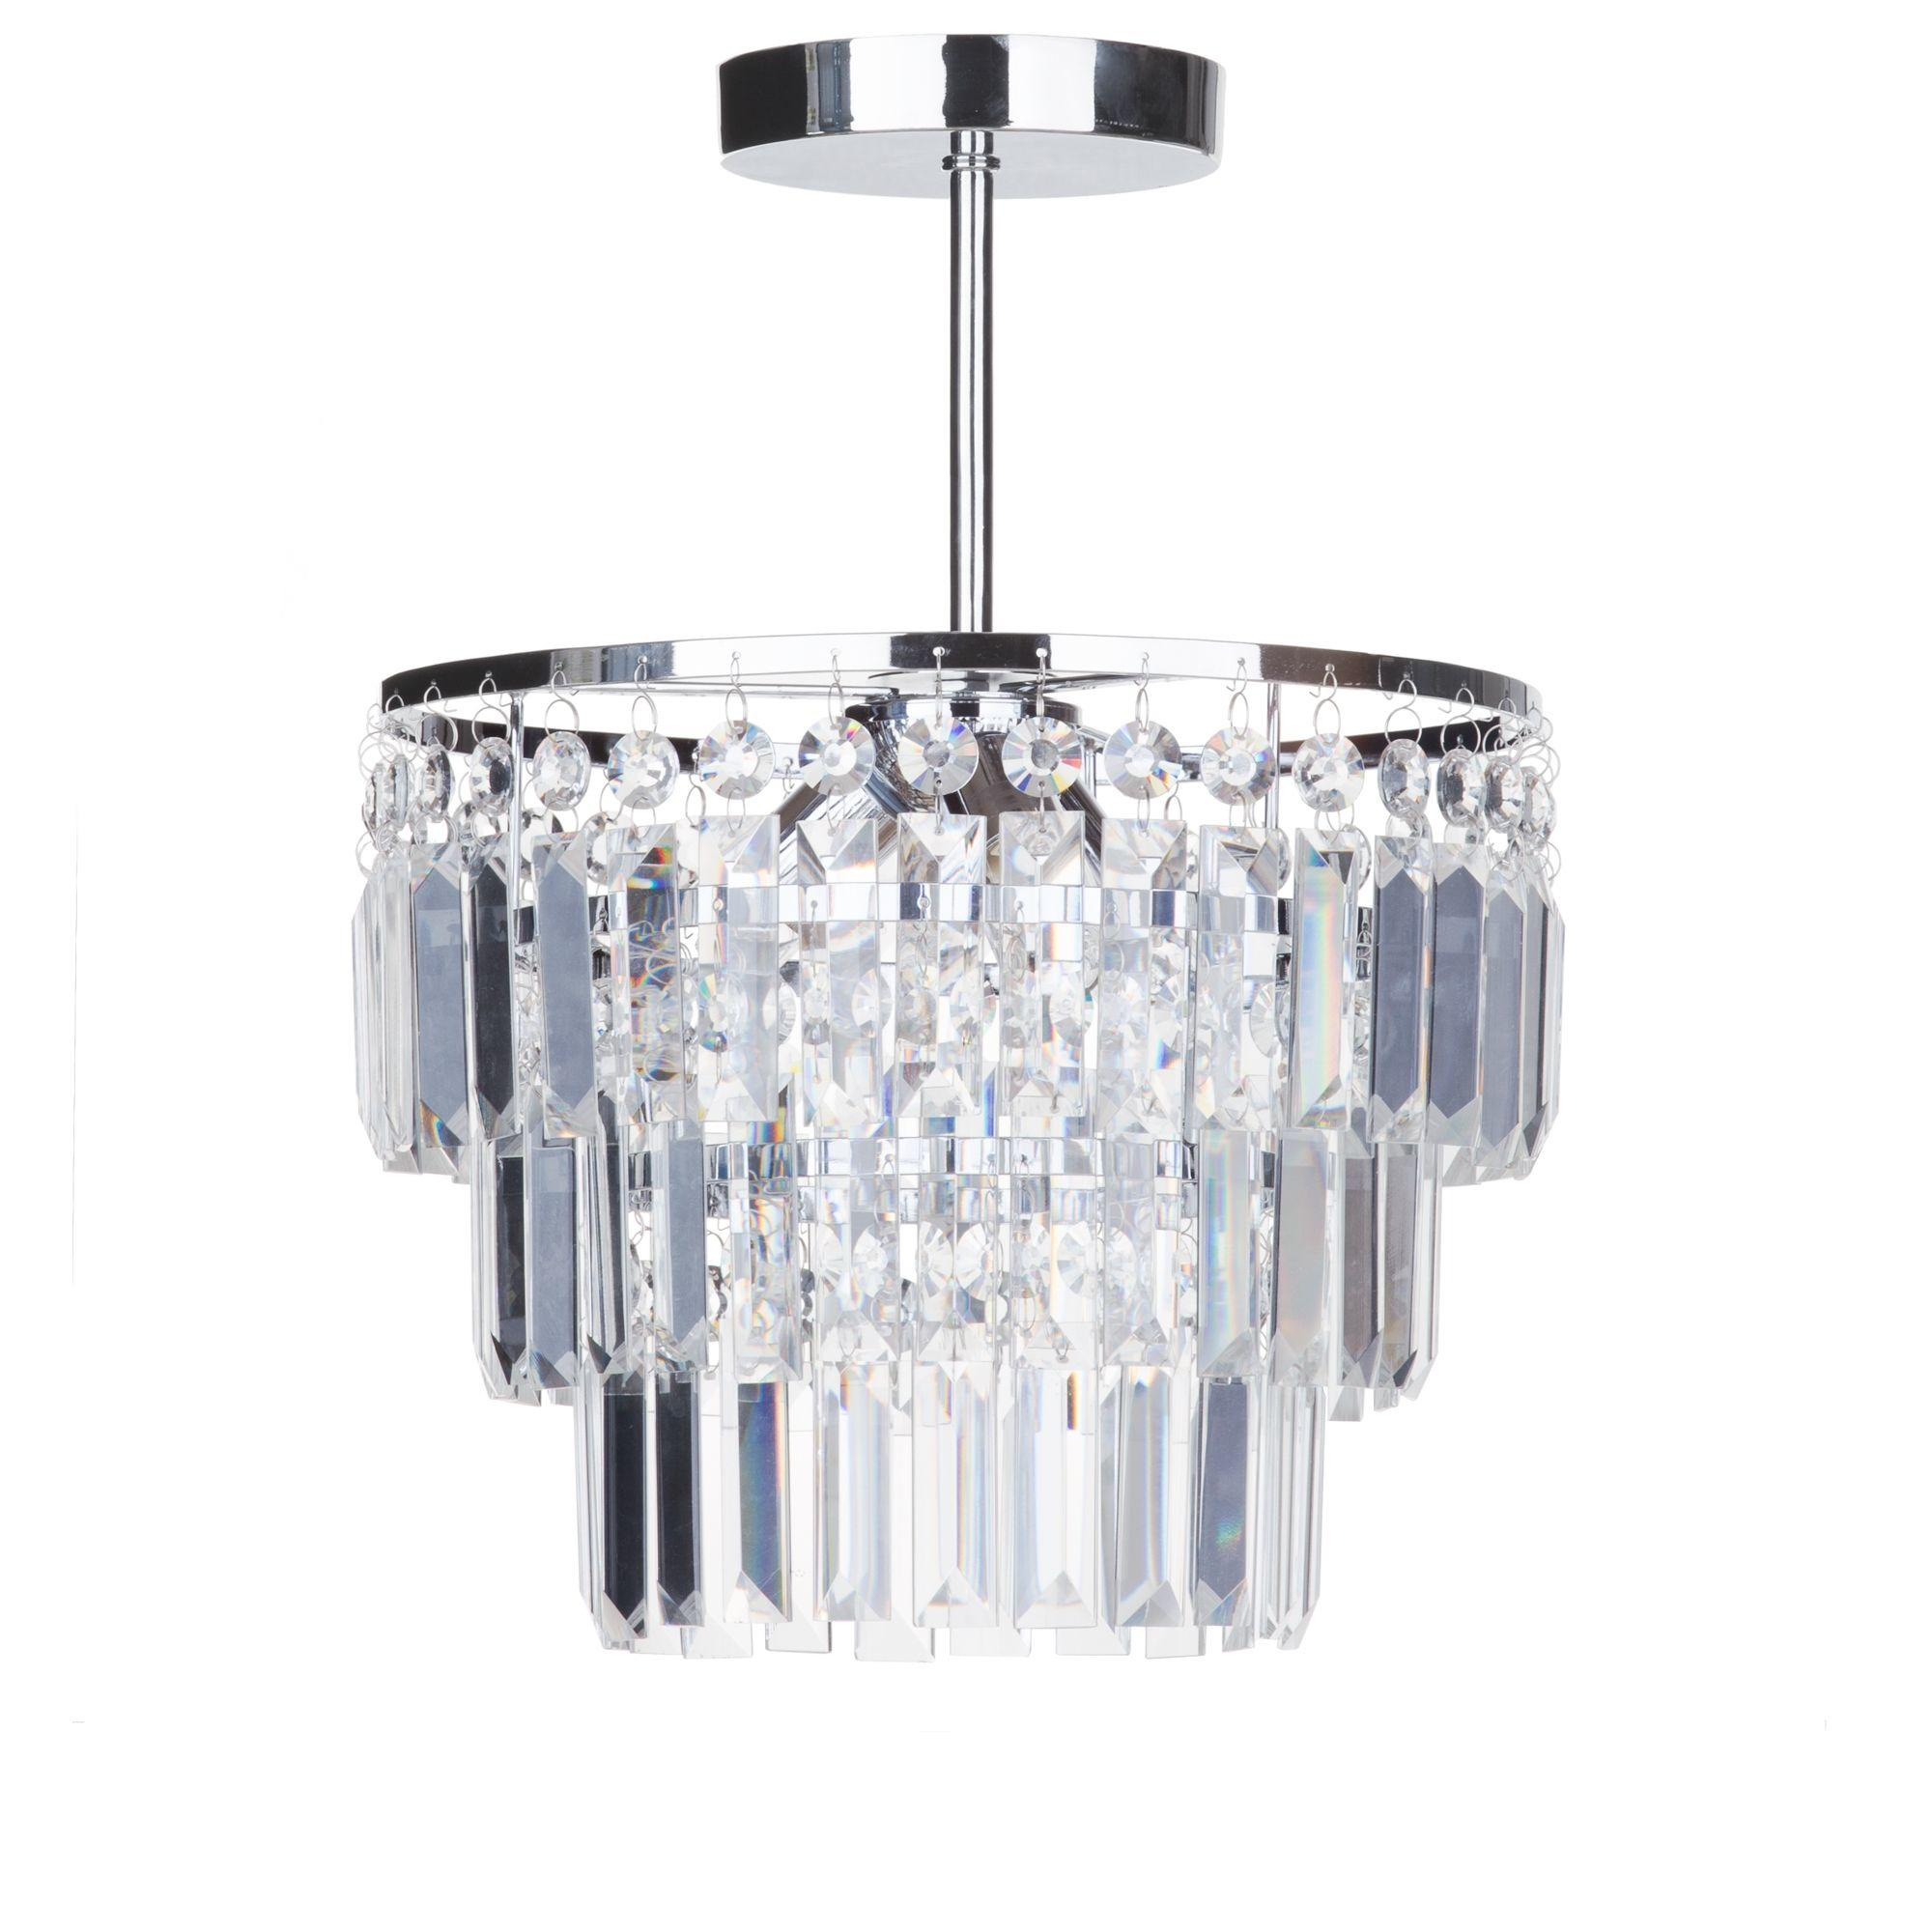 Bathroom Lighting Vasca Crystal Bar Bathroom Chandelier Semi Flush